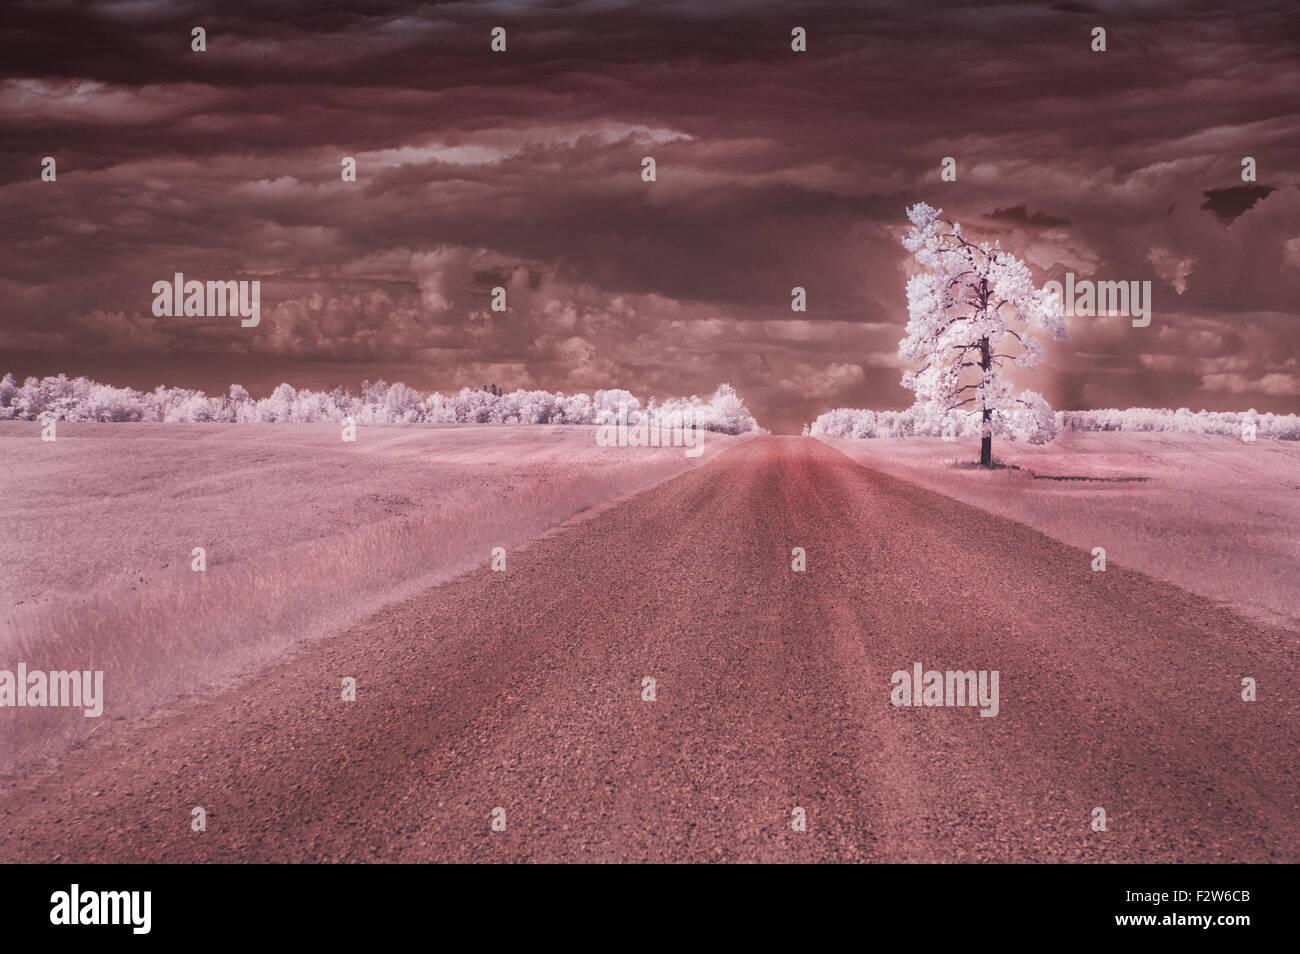 Fotografía infrarroja de una carretera solitaria. Imagen De Stock